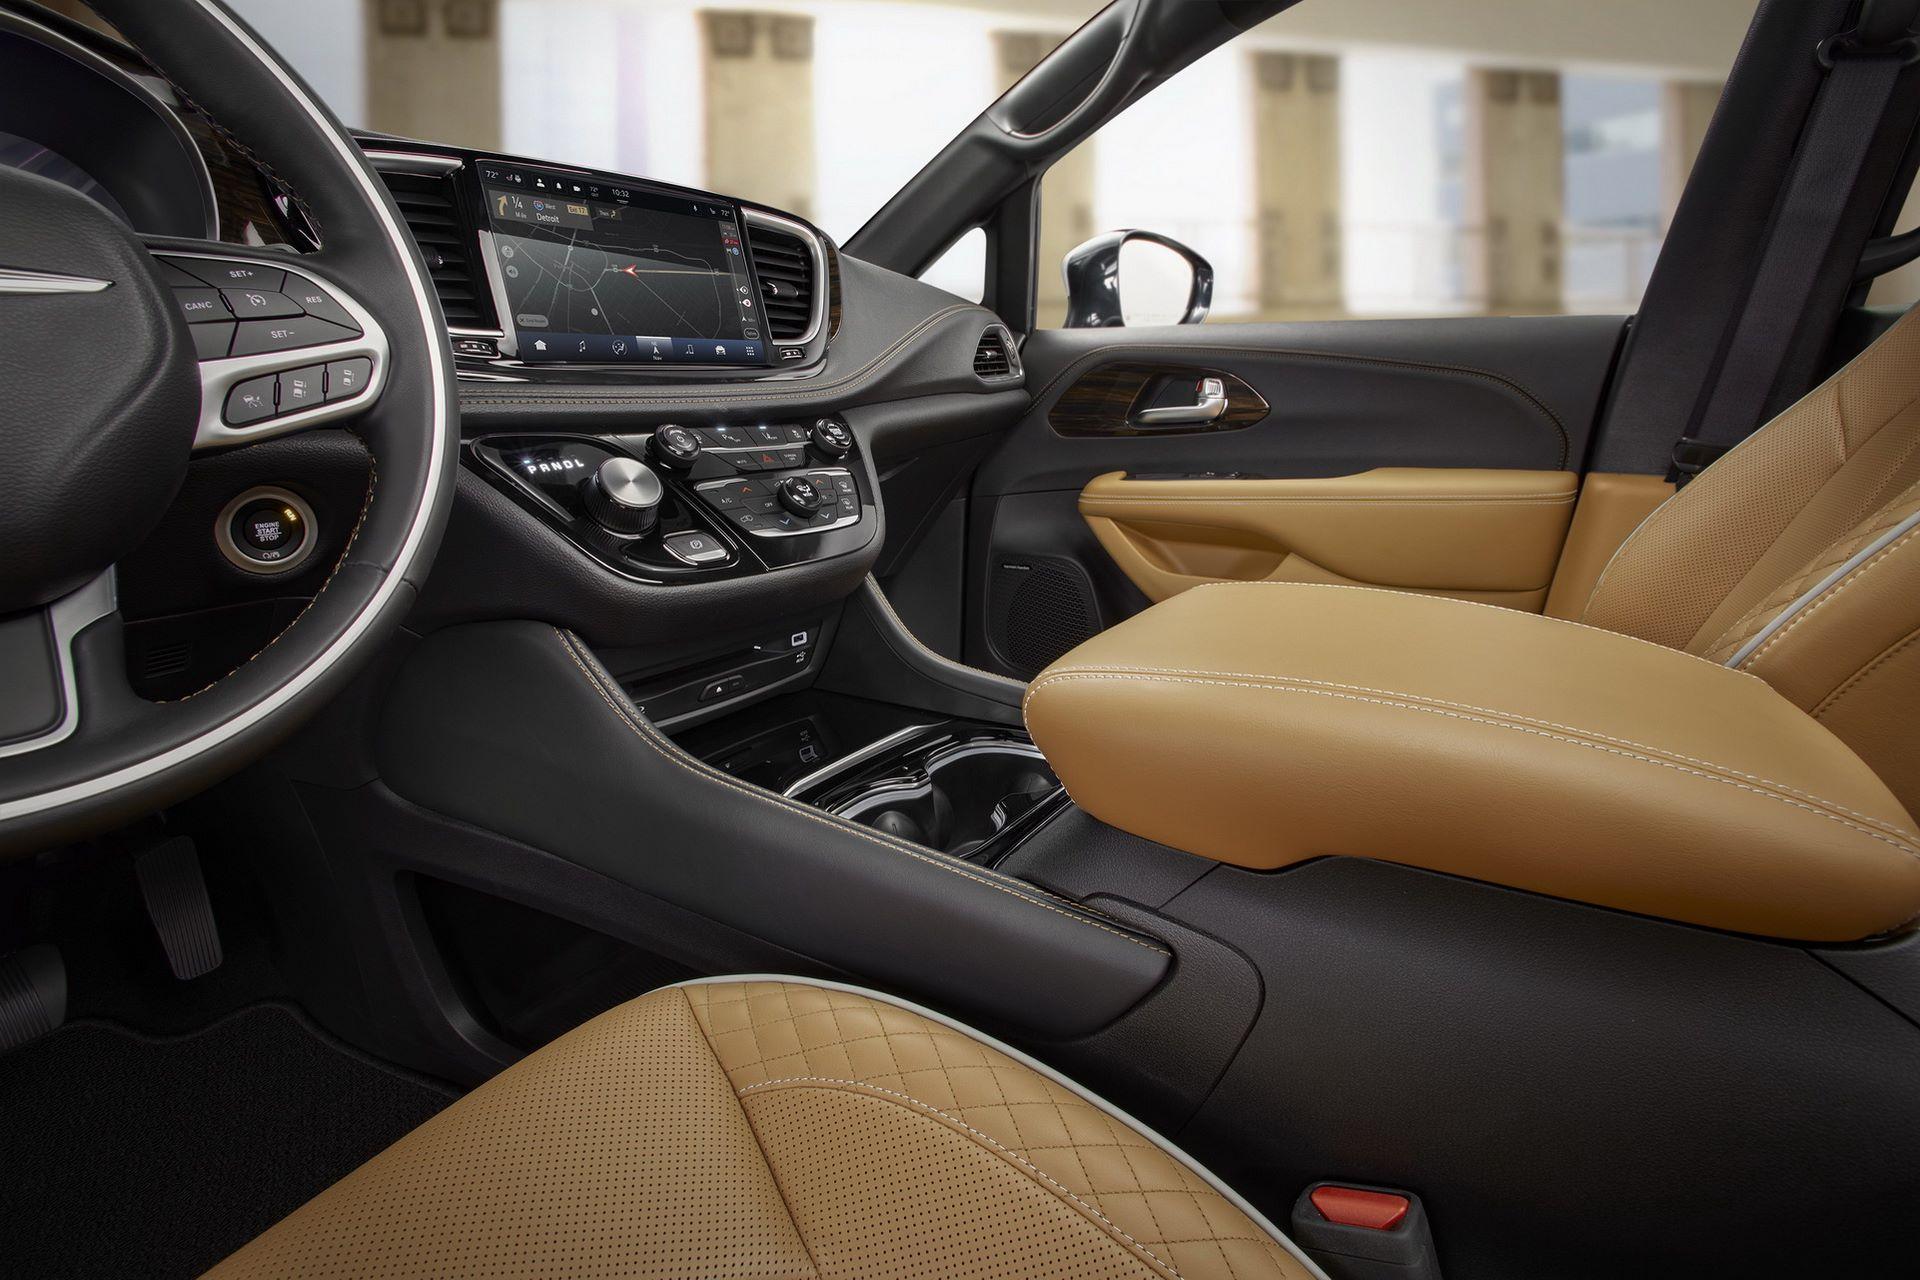 2021-Chrysler-Pacifica-75